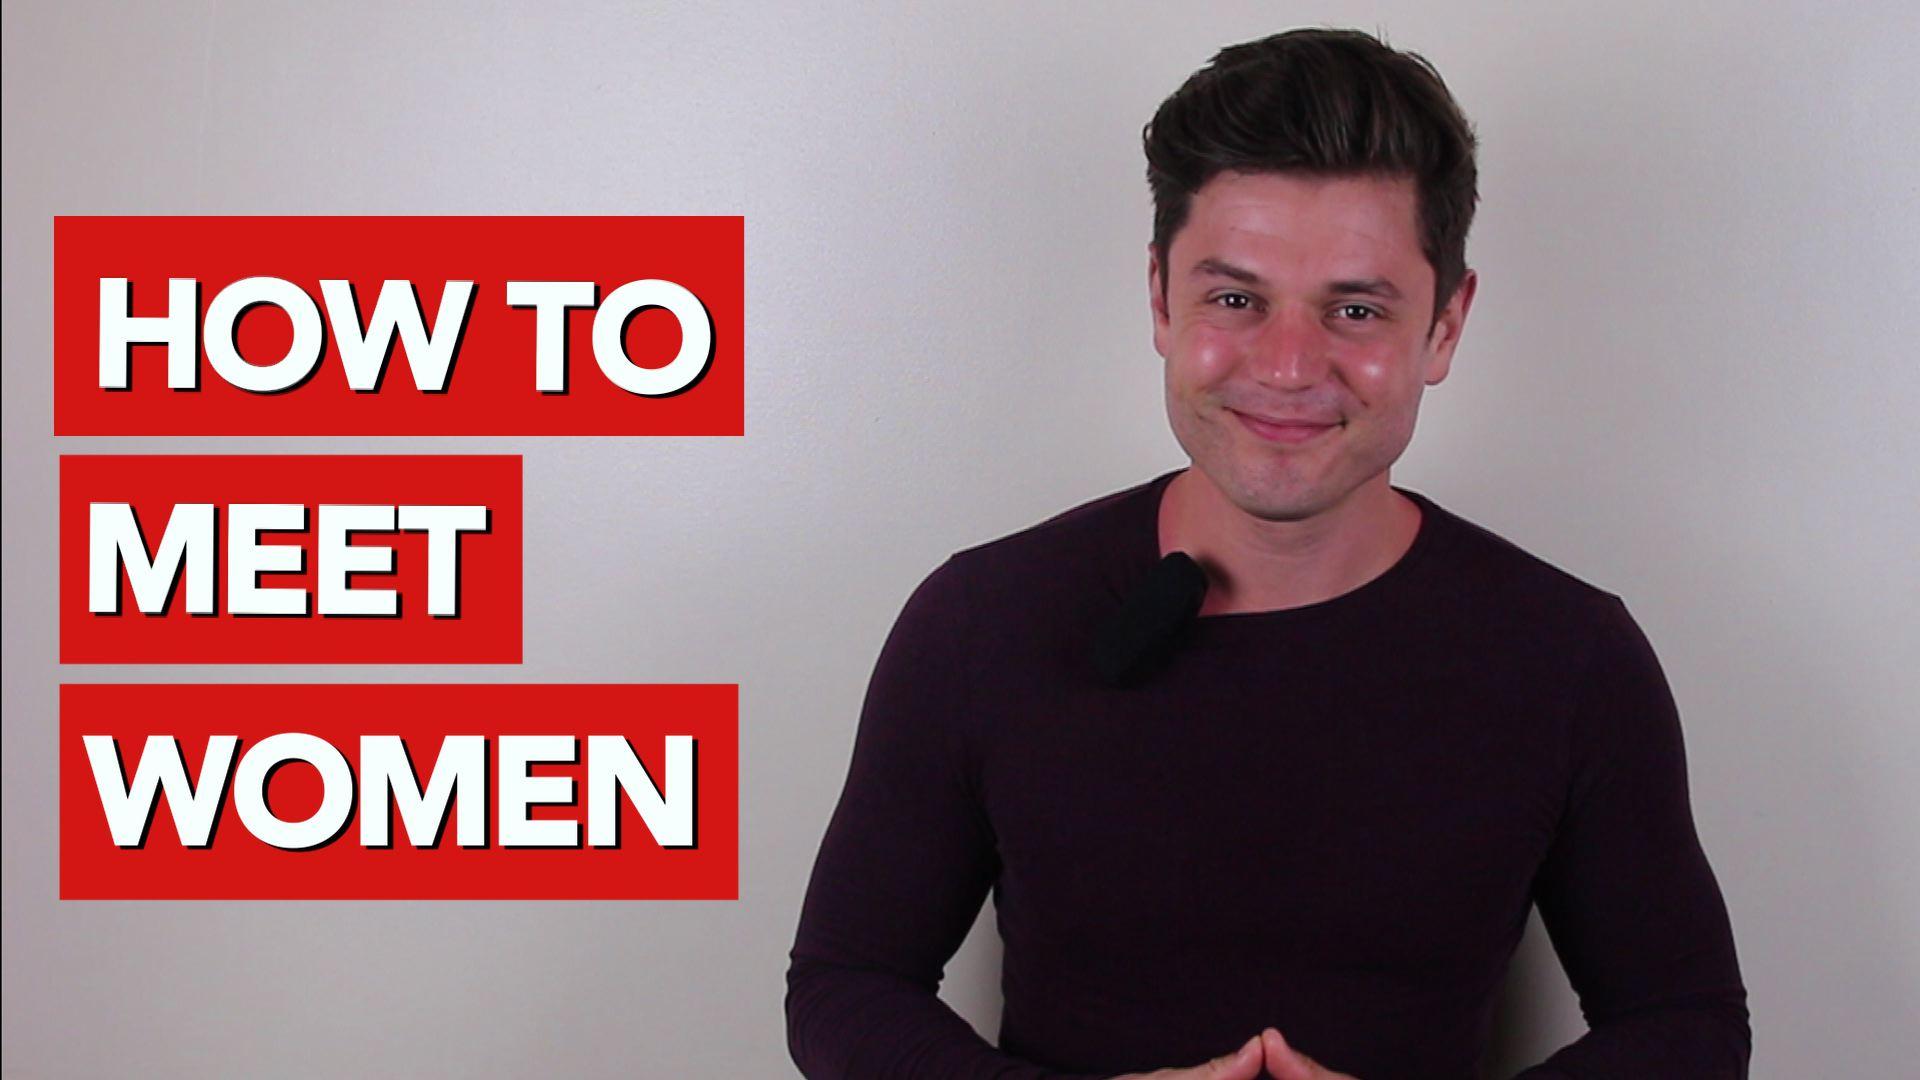 How to meet women